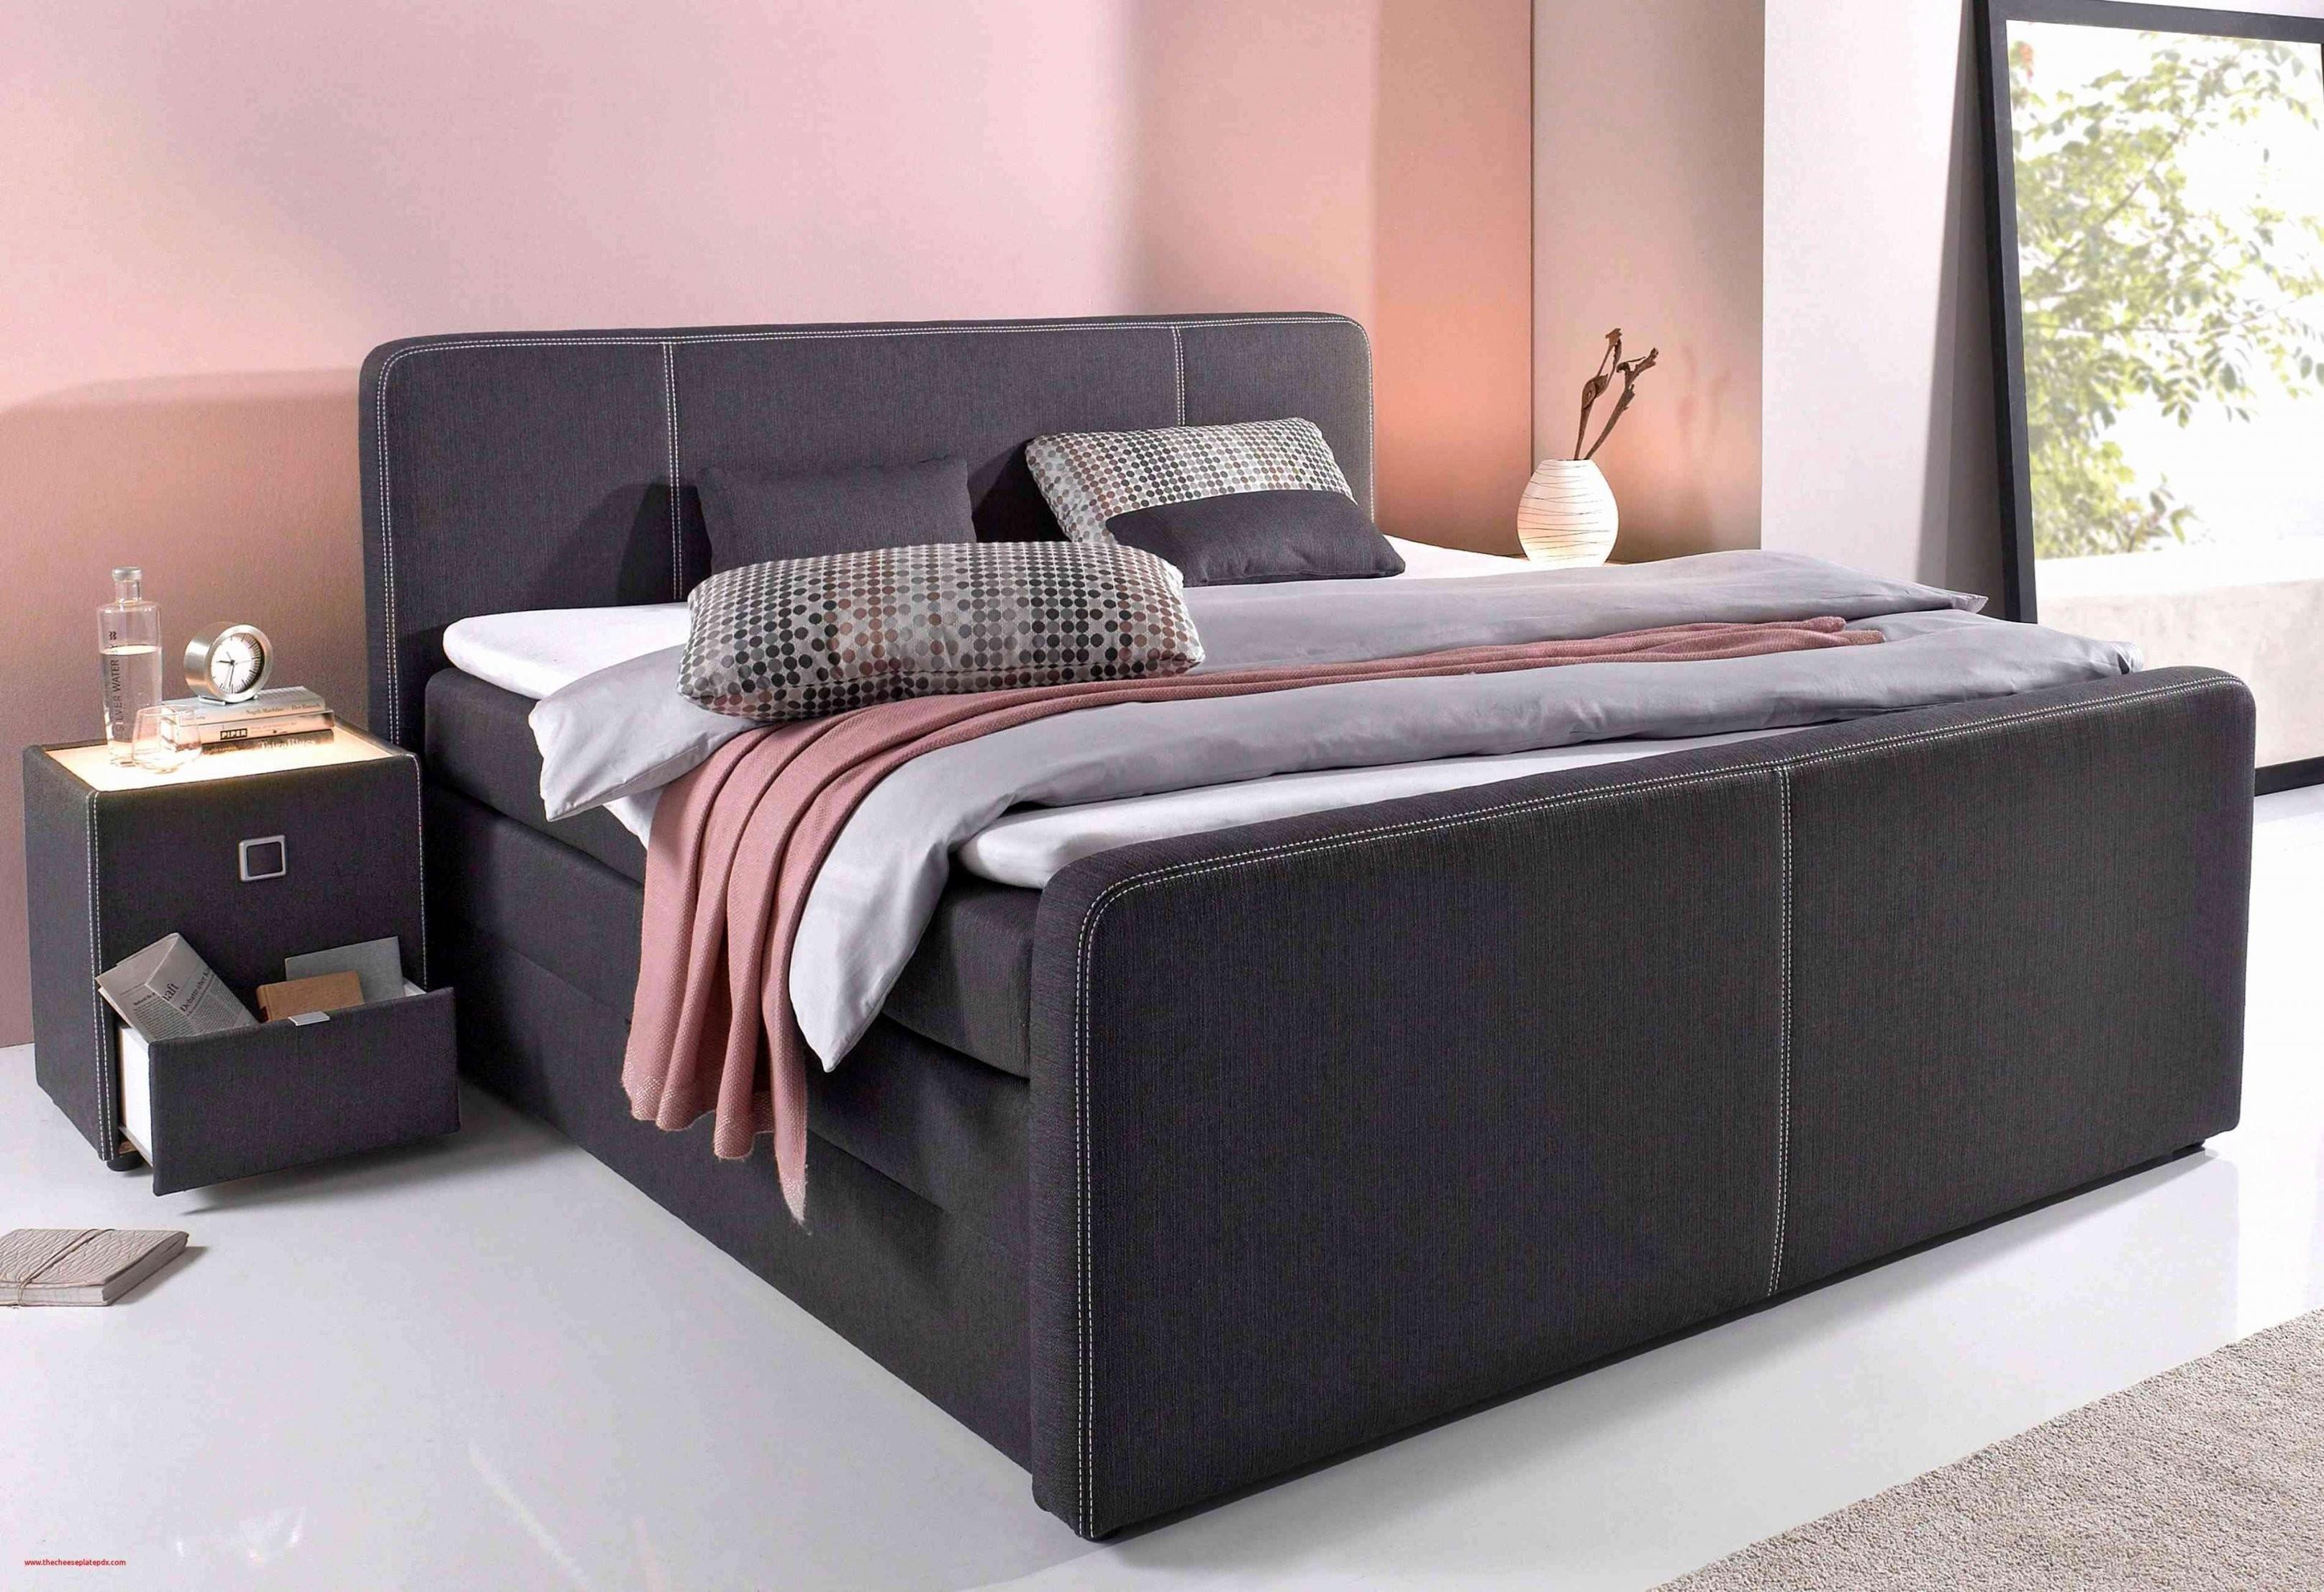 Hohes Bett Schön Hohes Bett Bett 140X200 Gebraucht Frisch Bett 140 von Bettgestell 140X200 Gebraucht Bild